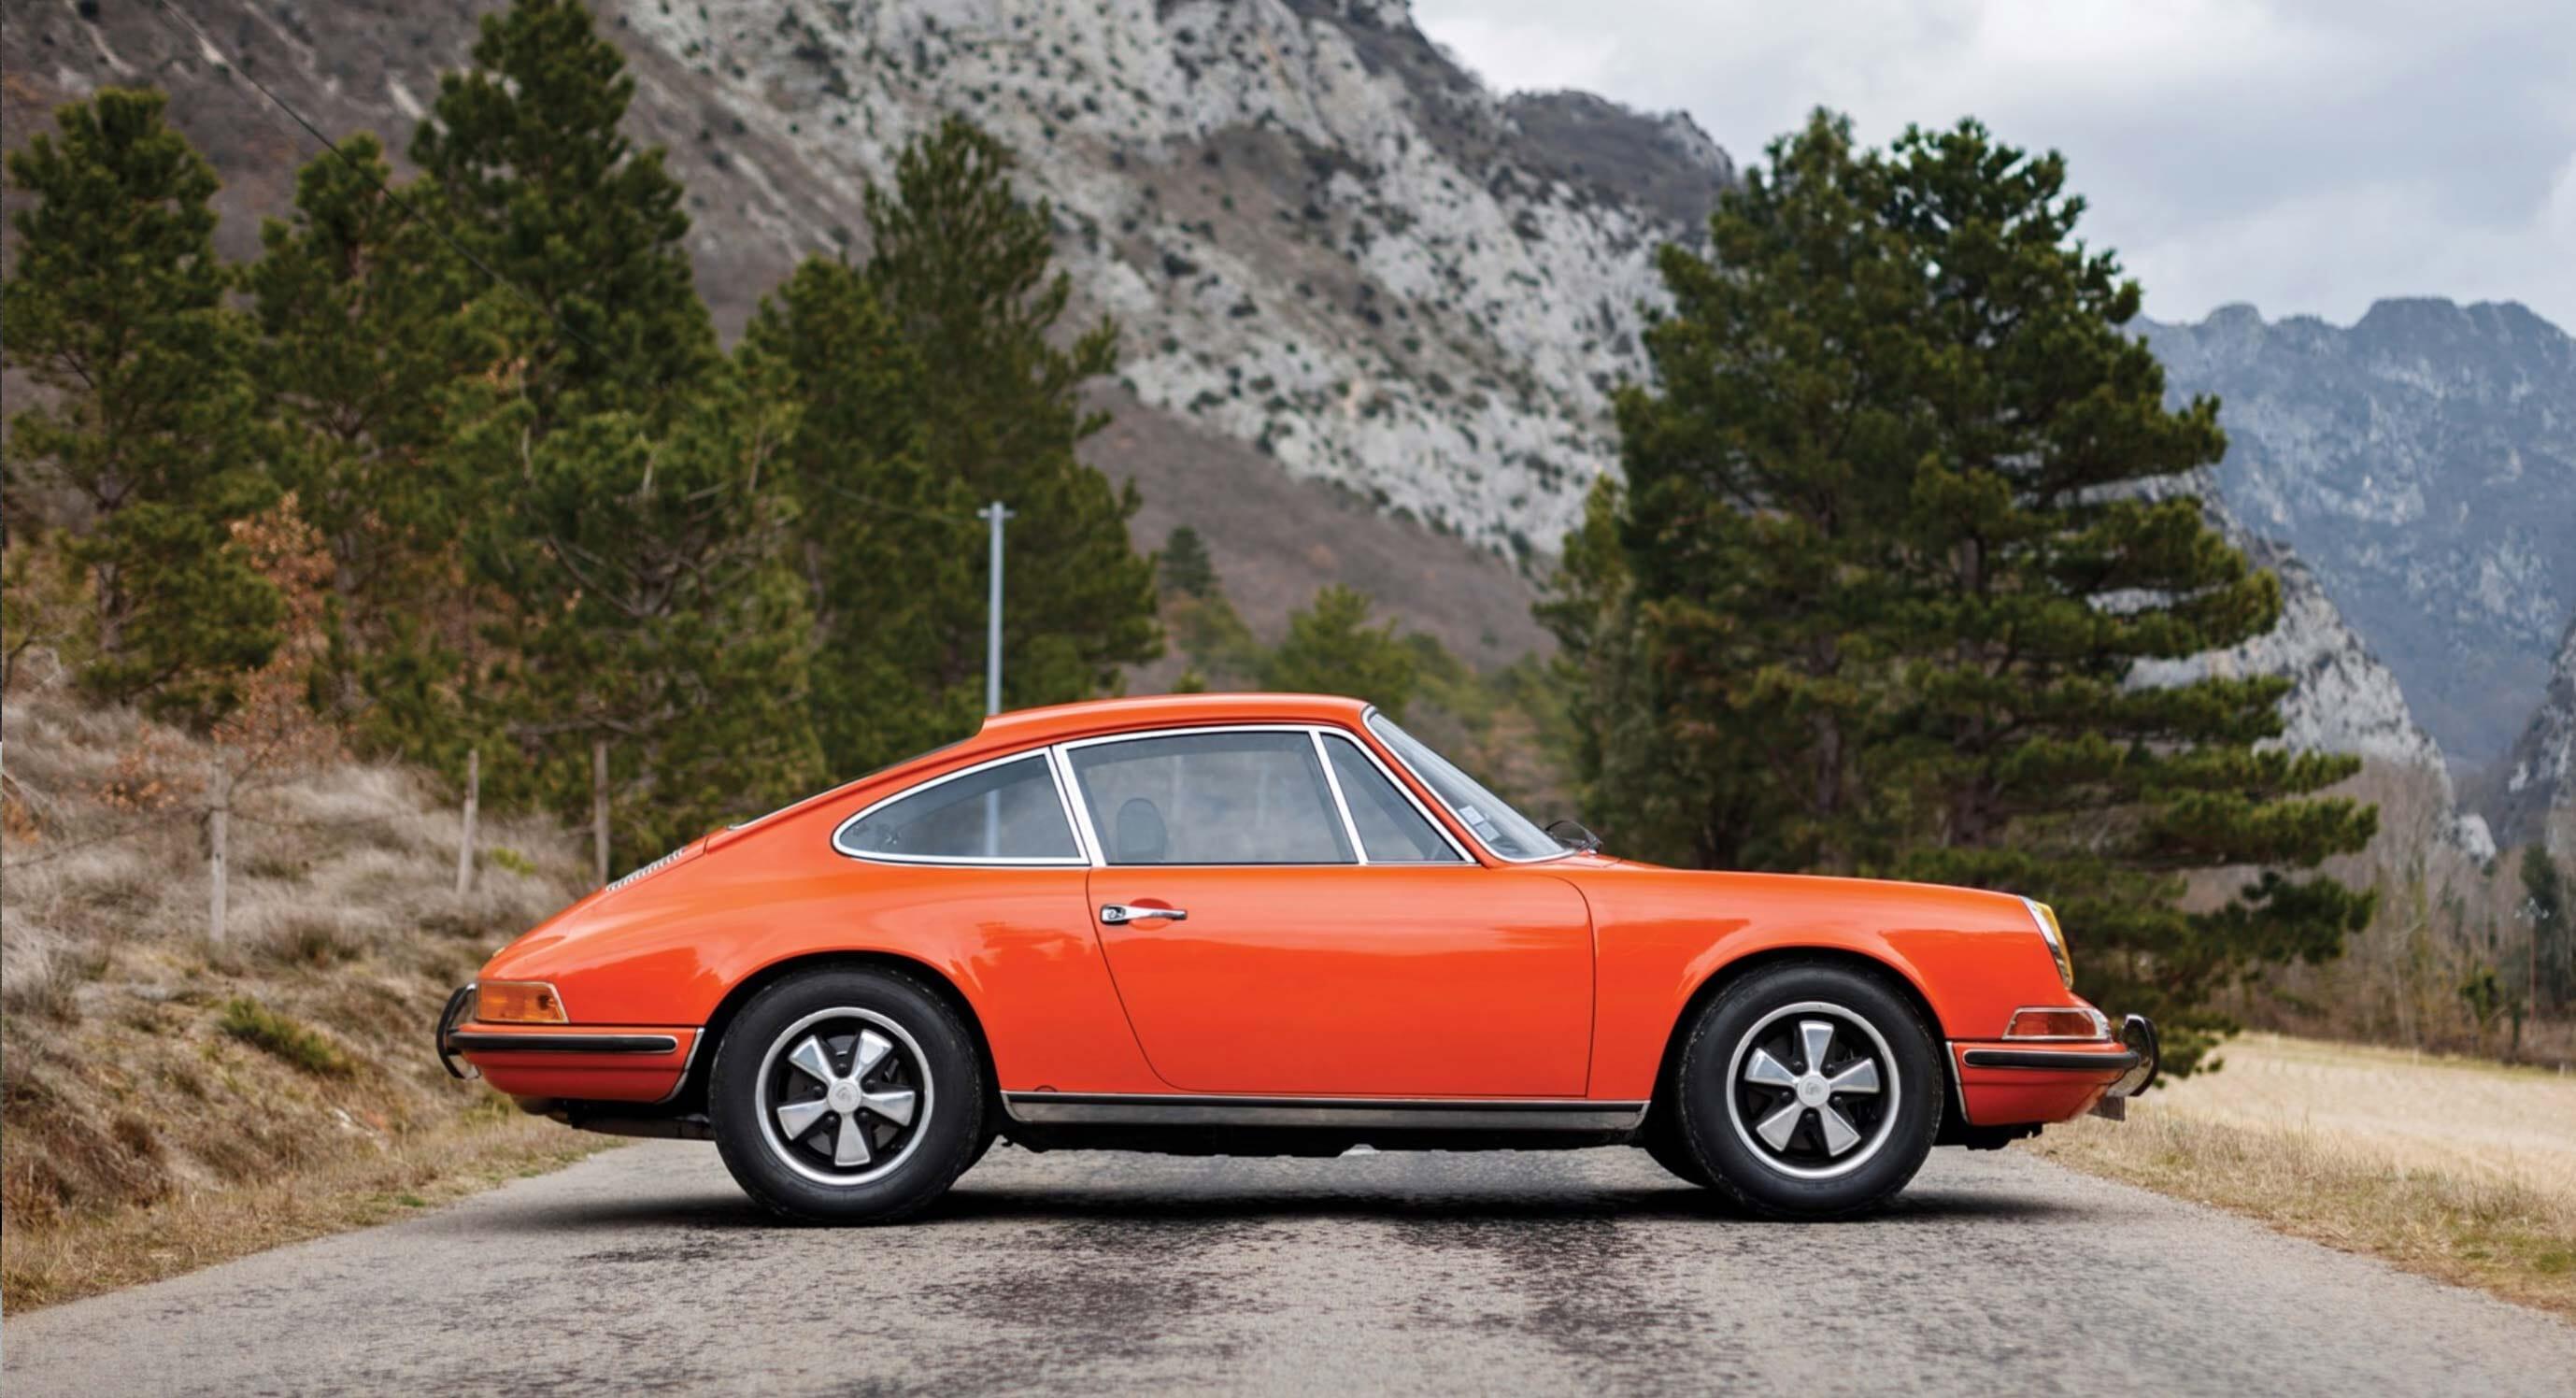 Classic Car Find of the Week: A 1969 Blood Orange Porsche 911 S 2.0